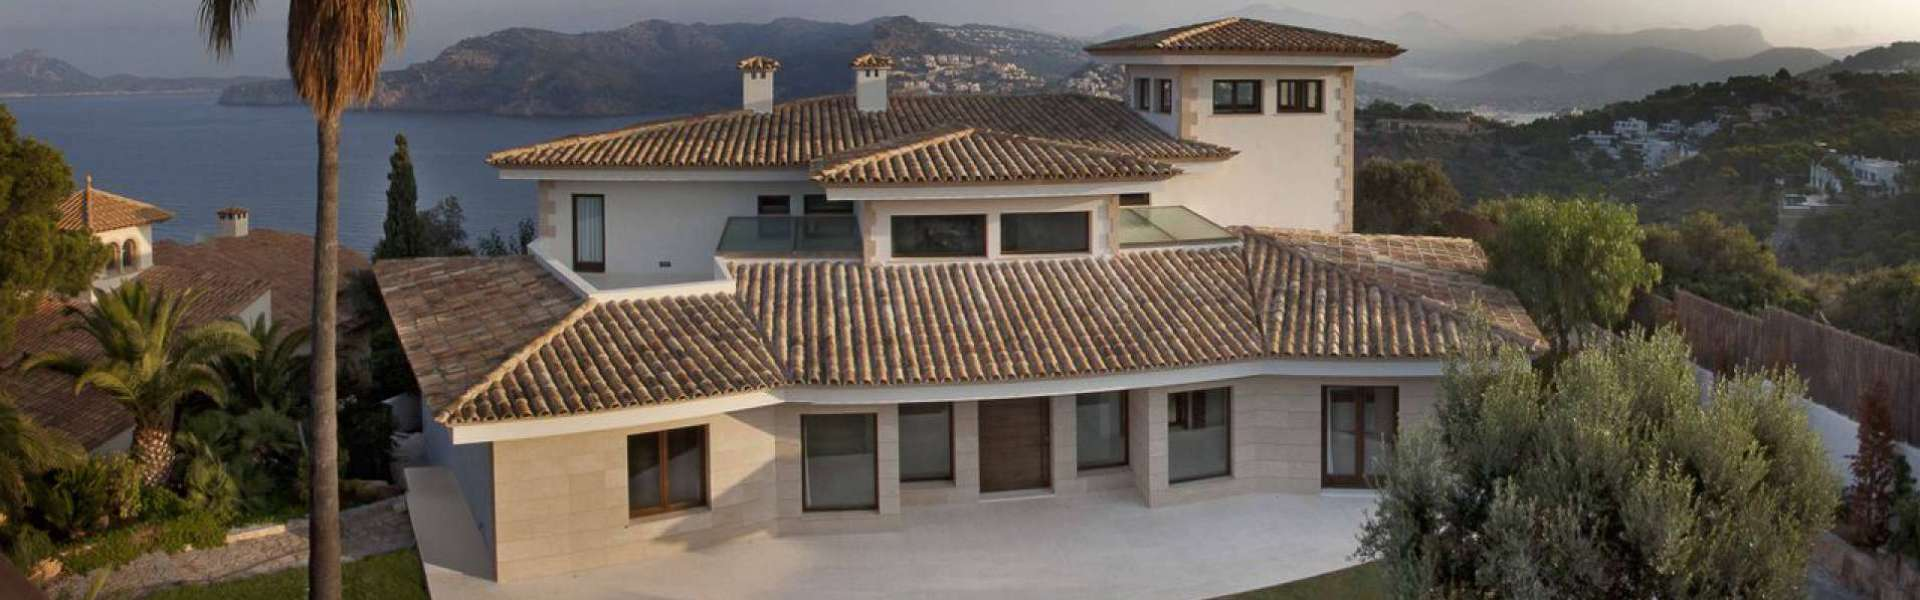 Port Andratx - Moderne Luxusvilla in spektakulärer Lage